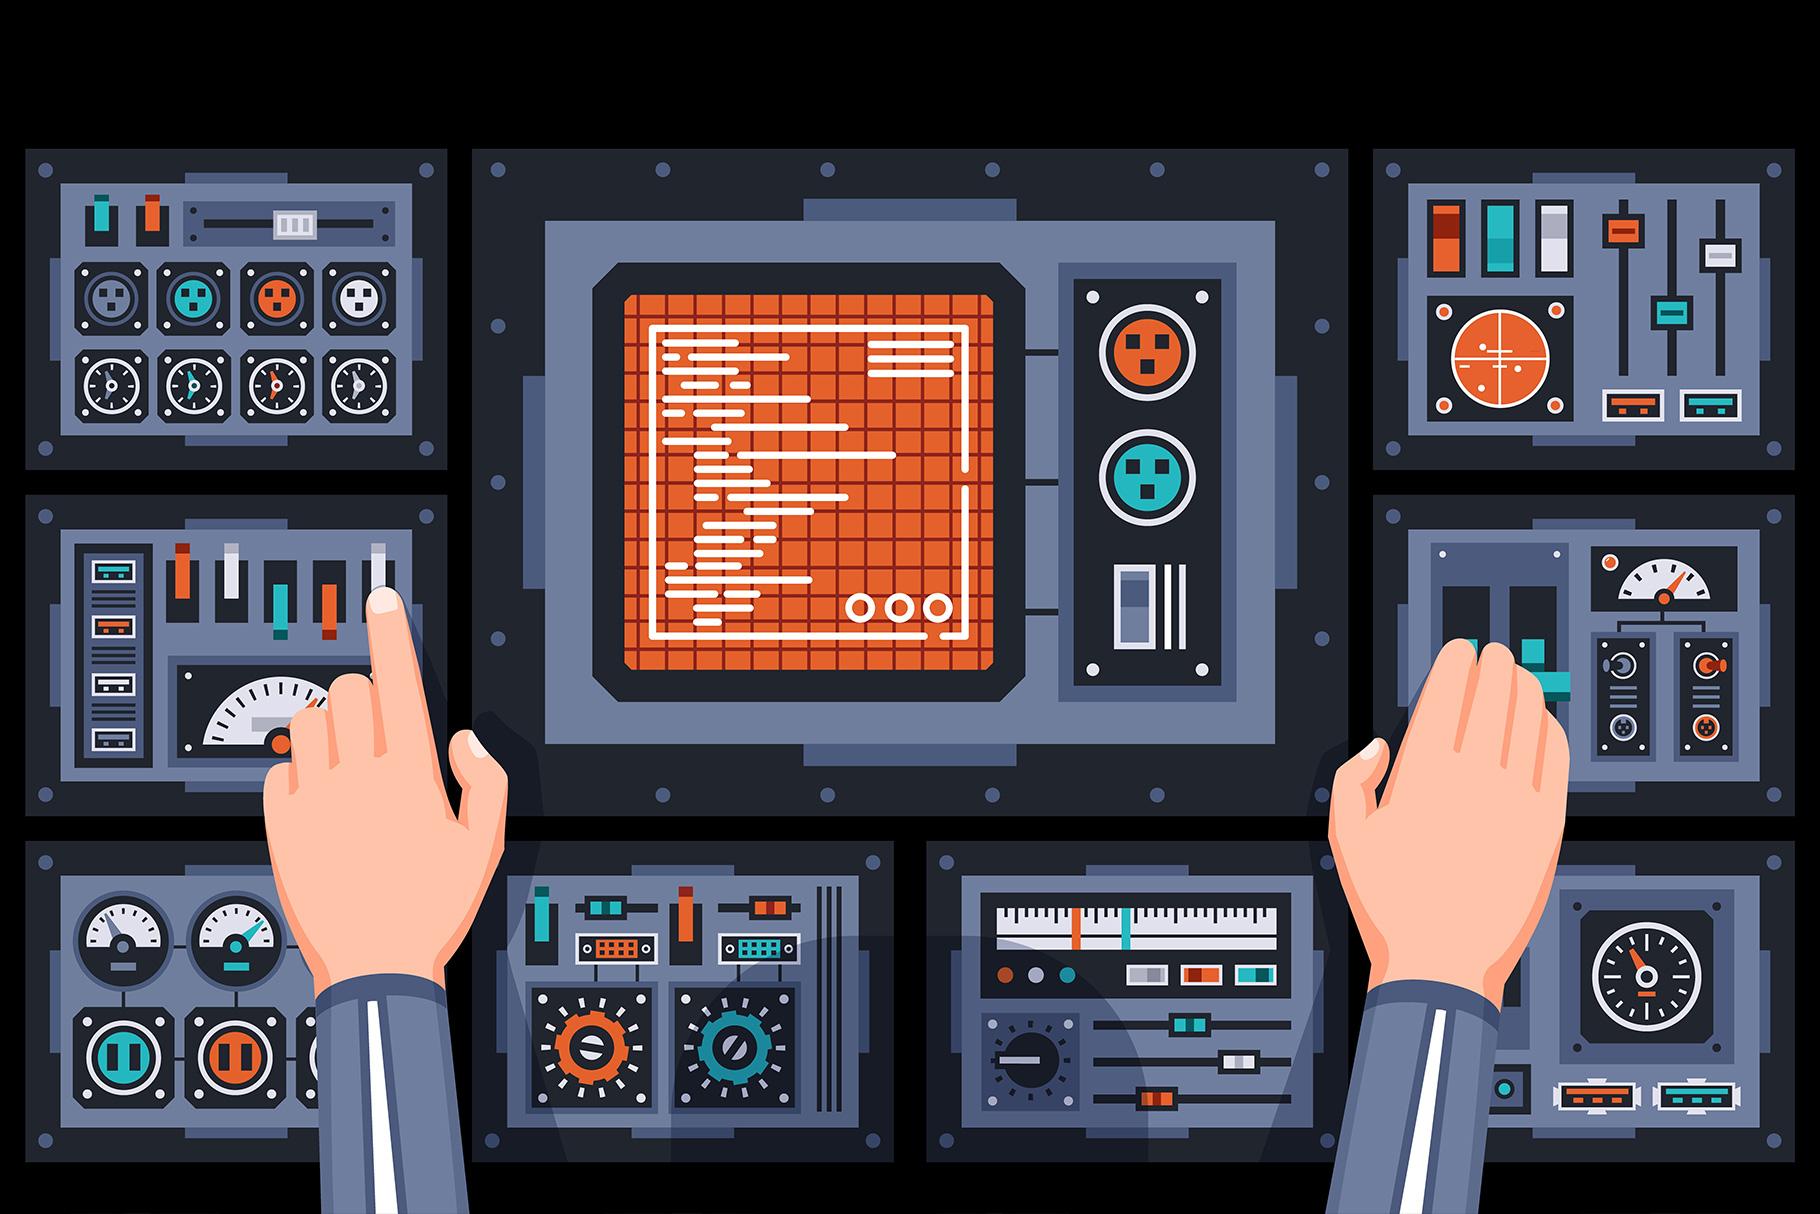 Control Panels Spaceship example image 7